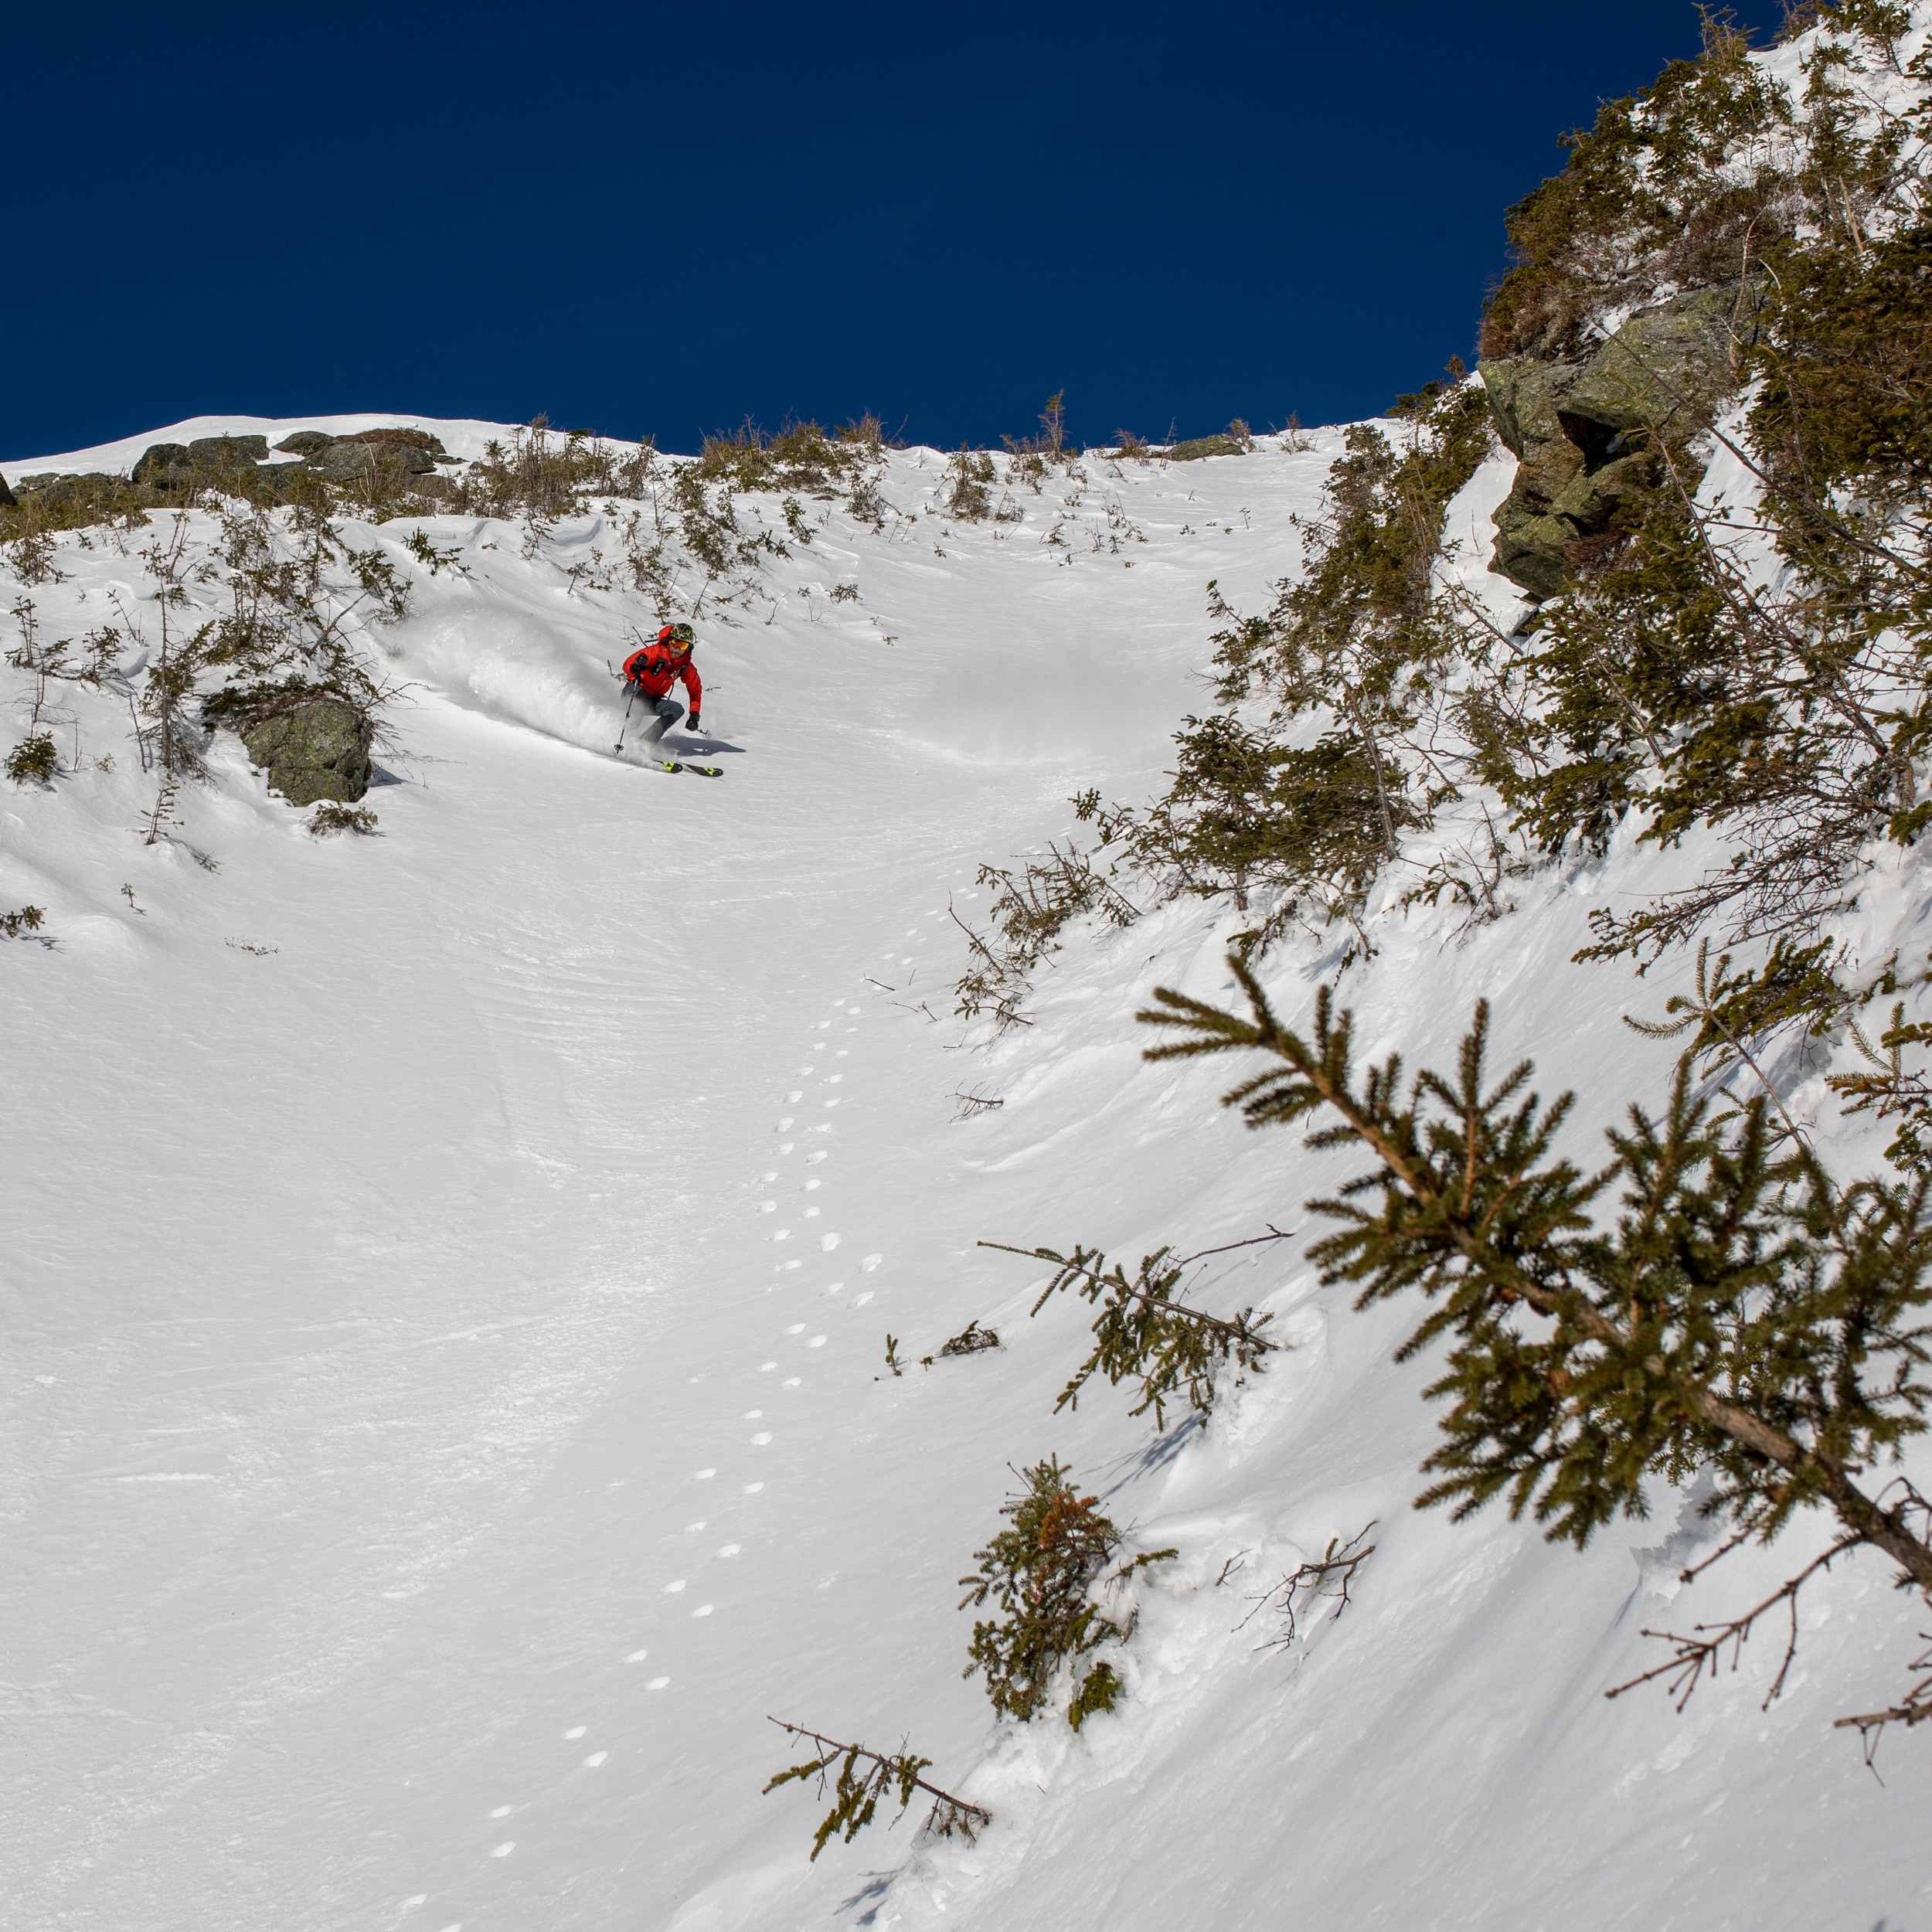 Andrew Drummond Skiing White Mountain Backcountry.jpg